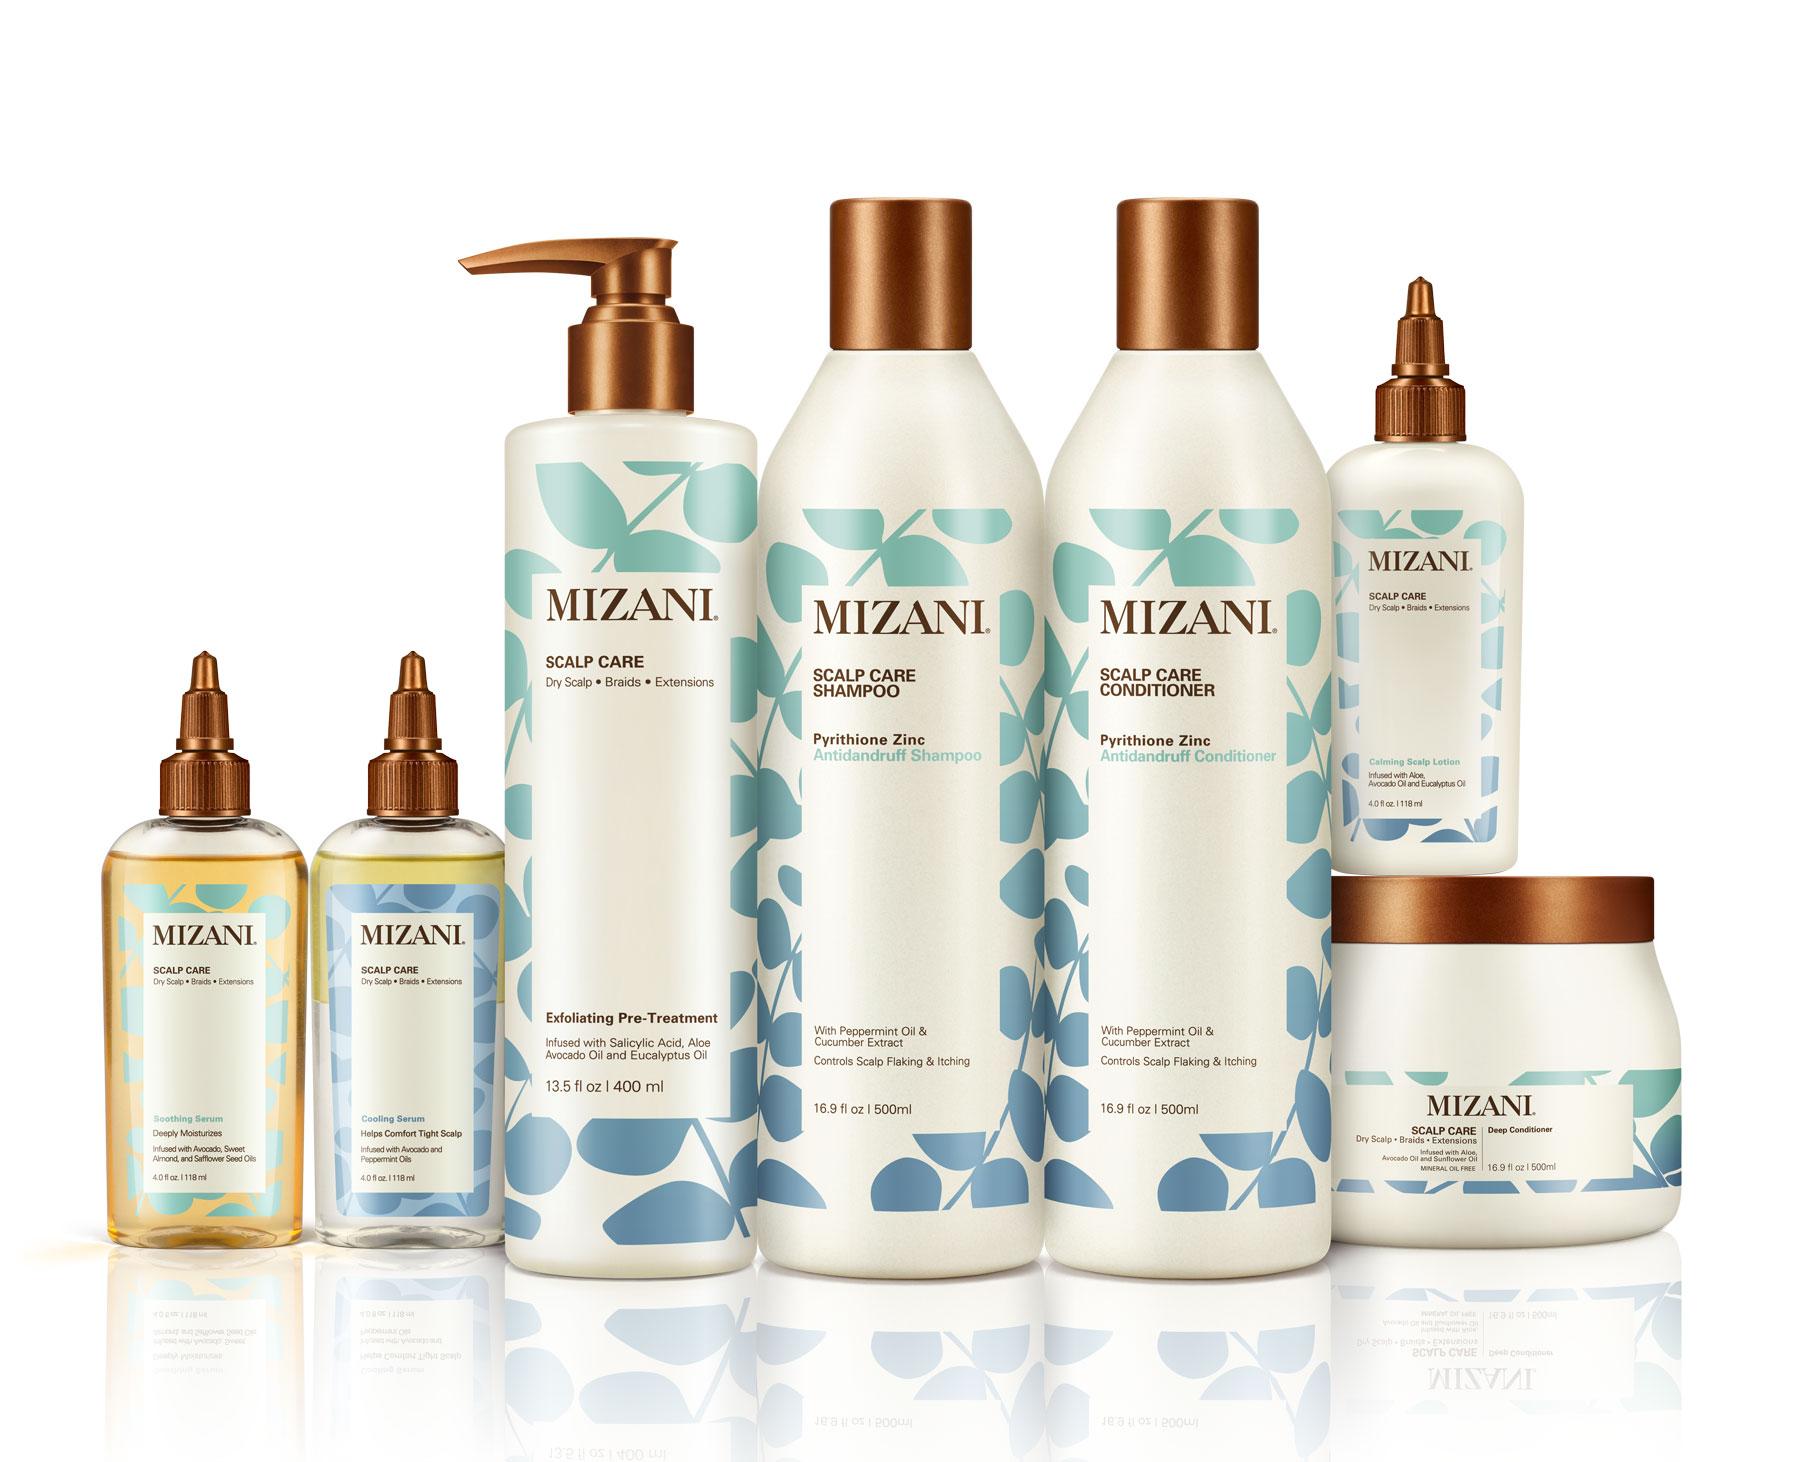 Mizani Introduces Scalp Care Professional Salon Service and Retail Range